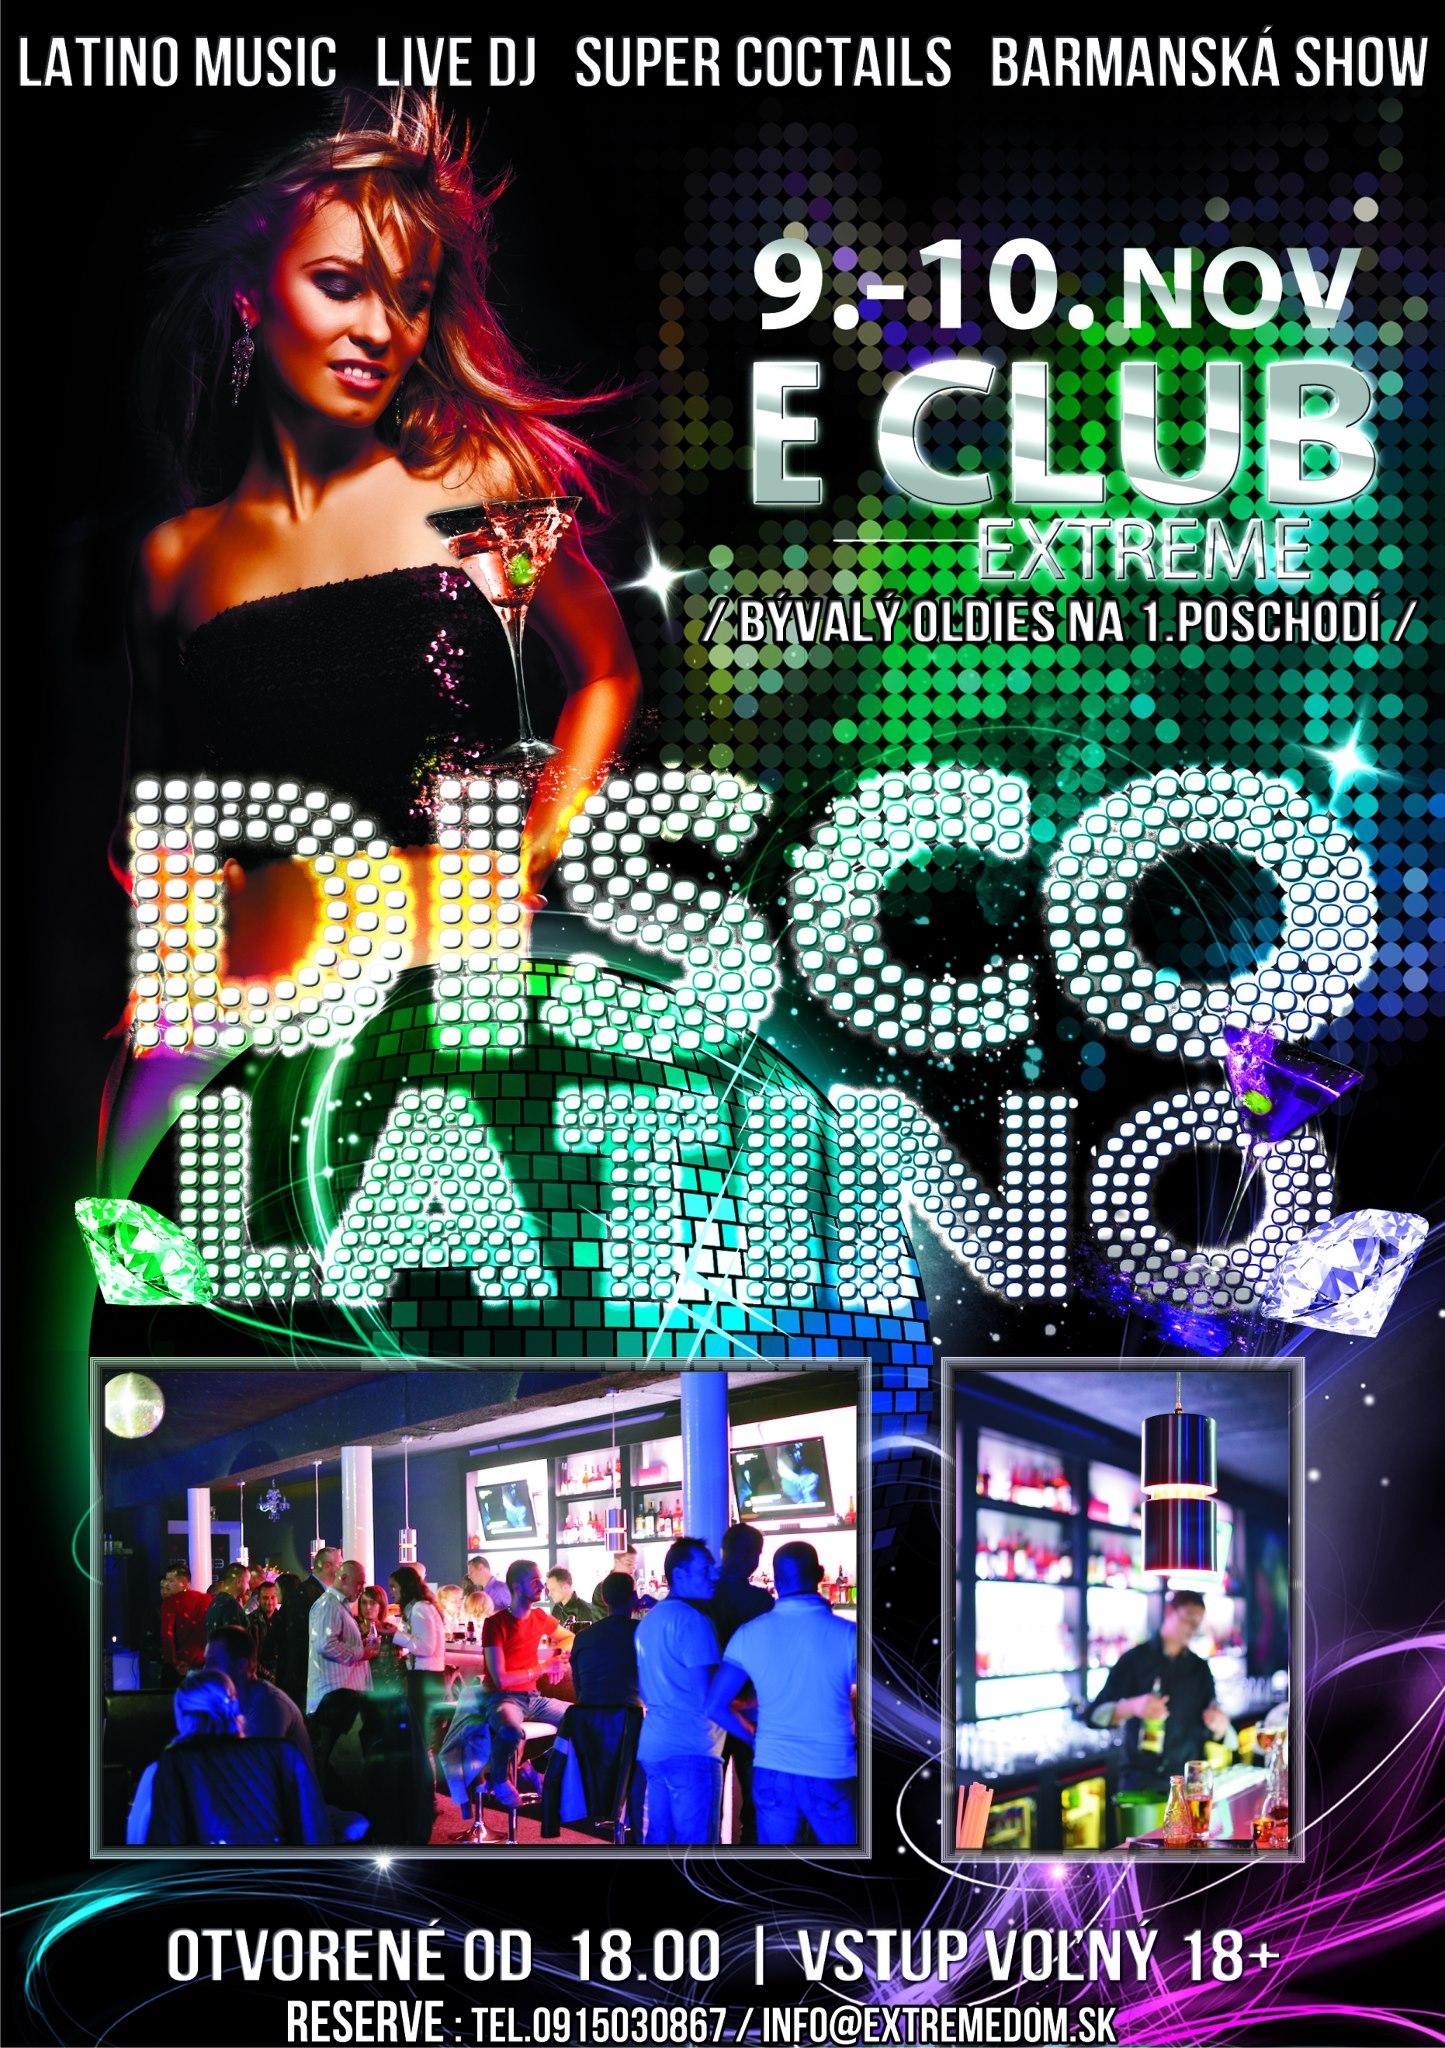 LATINO DISCO víkend / Latino music - Live Dj - Barmanská show